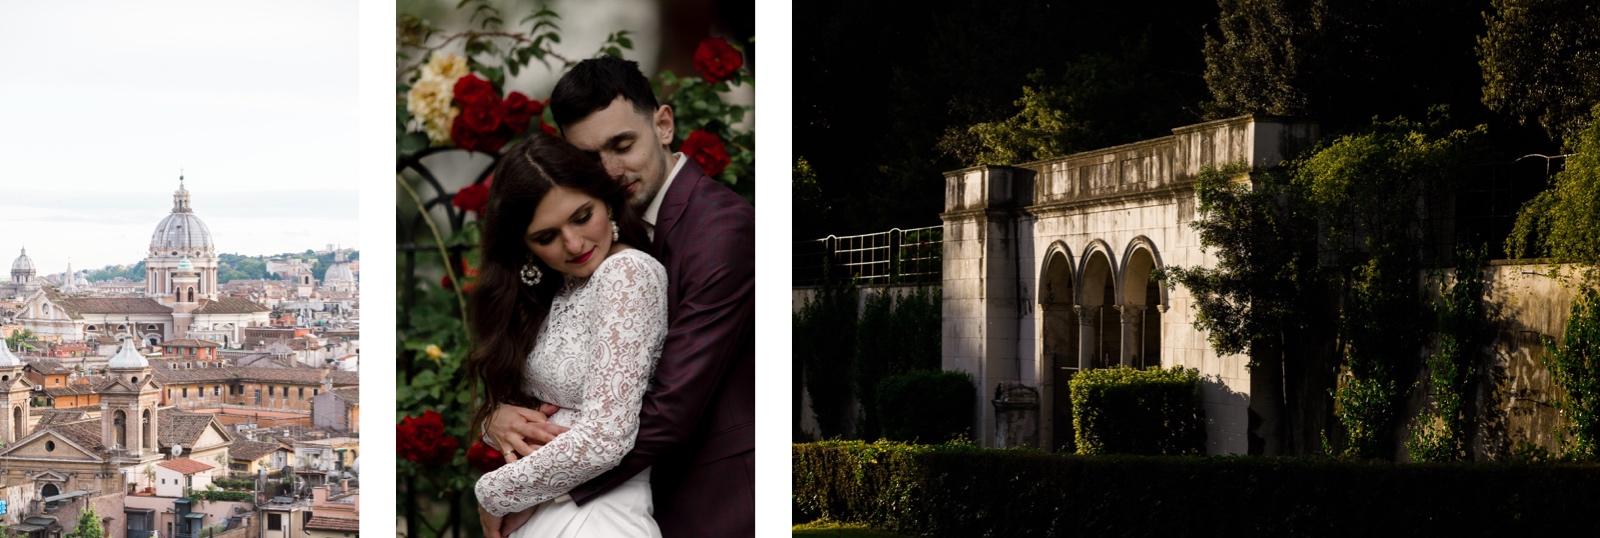 Fotomagoria Wedding Rome Photographer 23.jpg